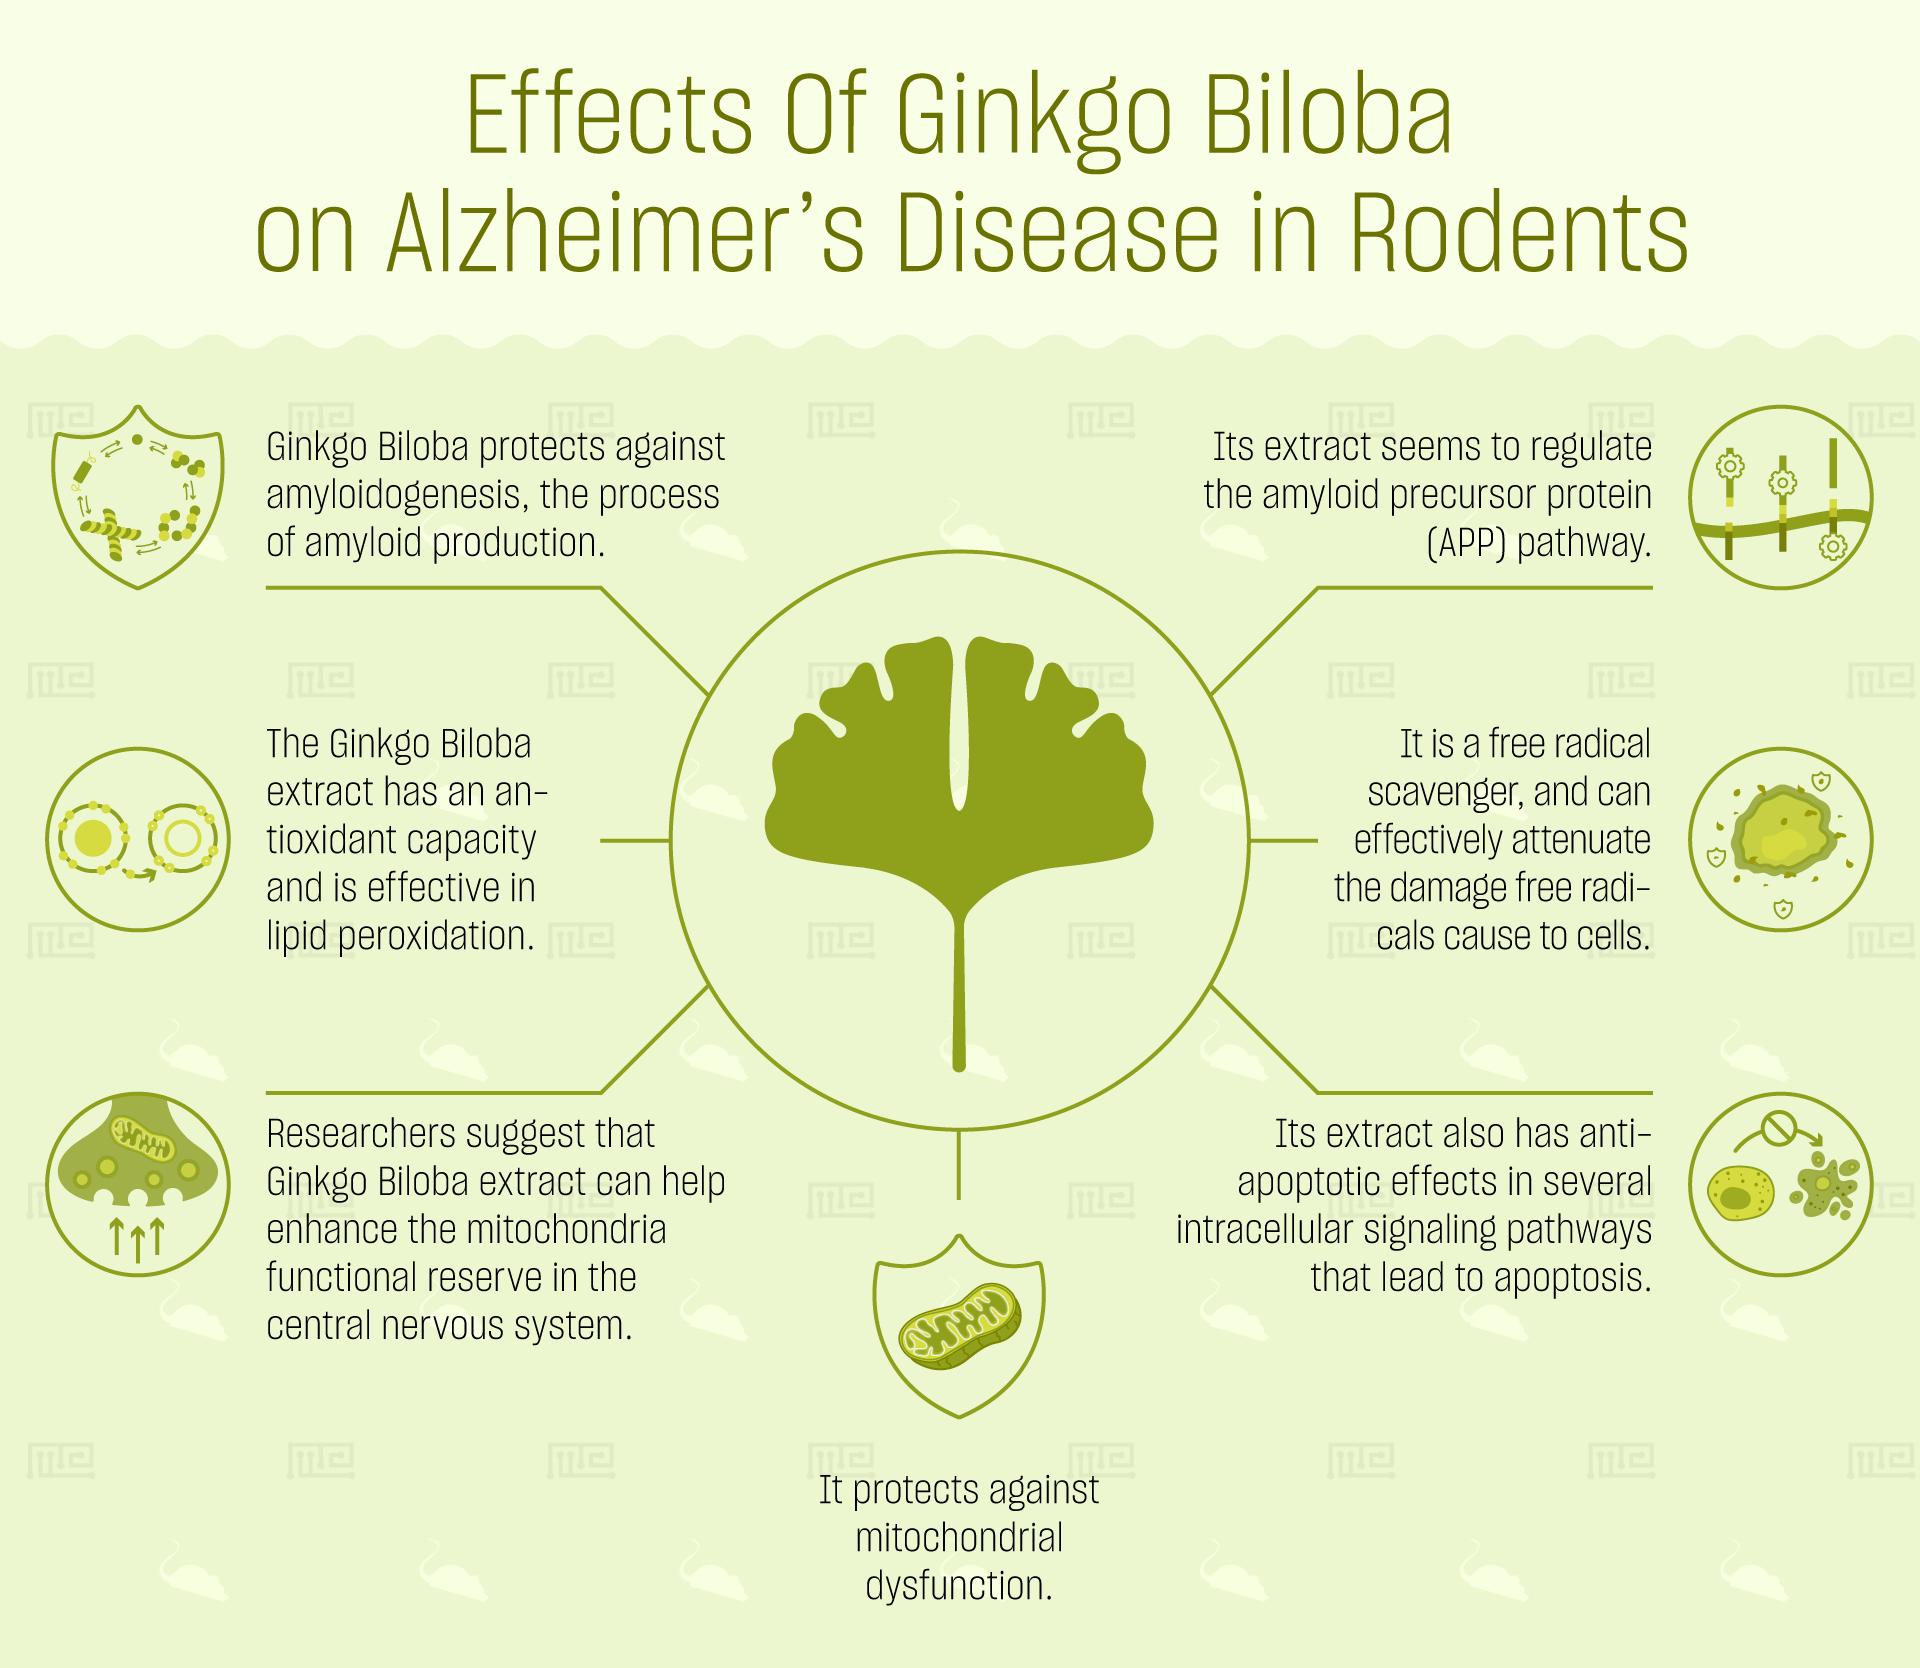 effects of ginkgo biloba on behavior